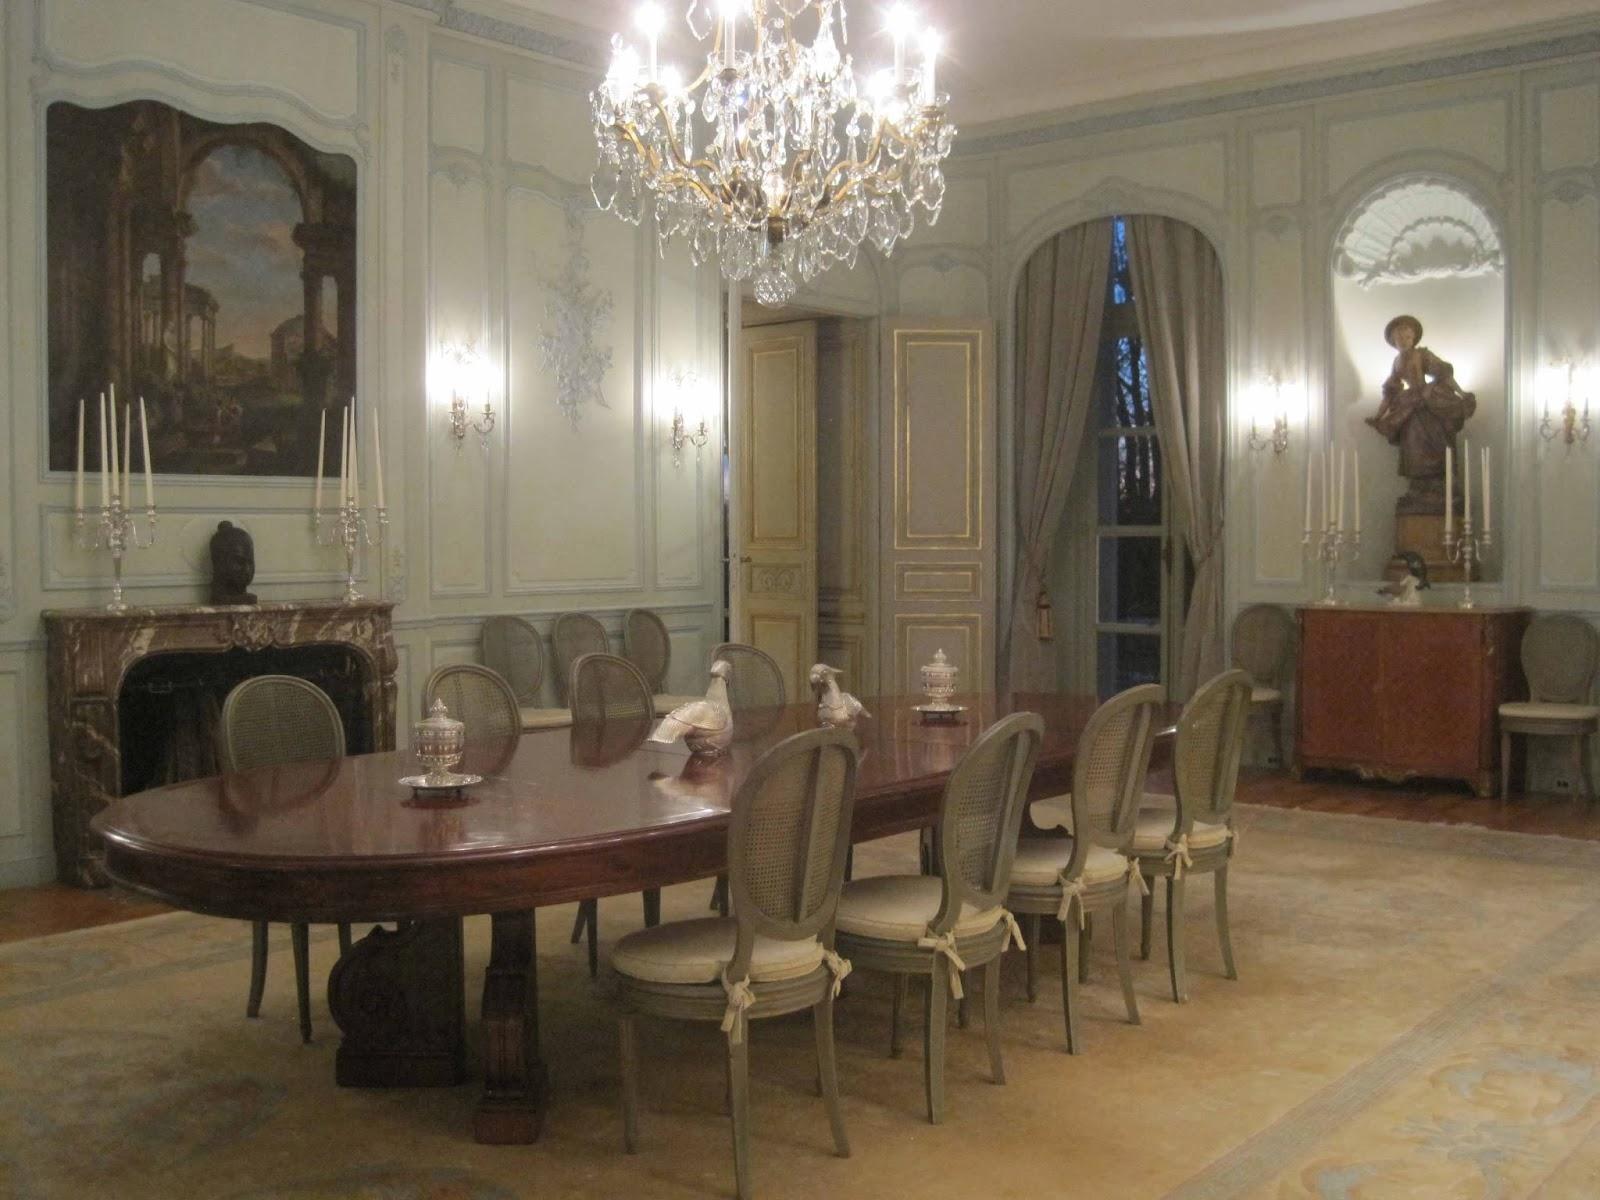 architect design: Belgian ambassador's residence